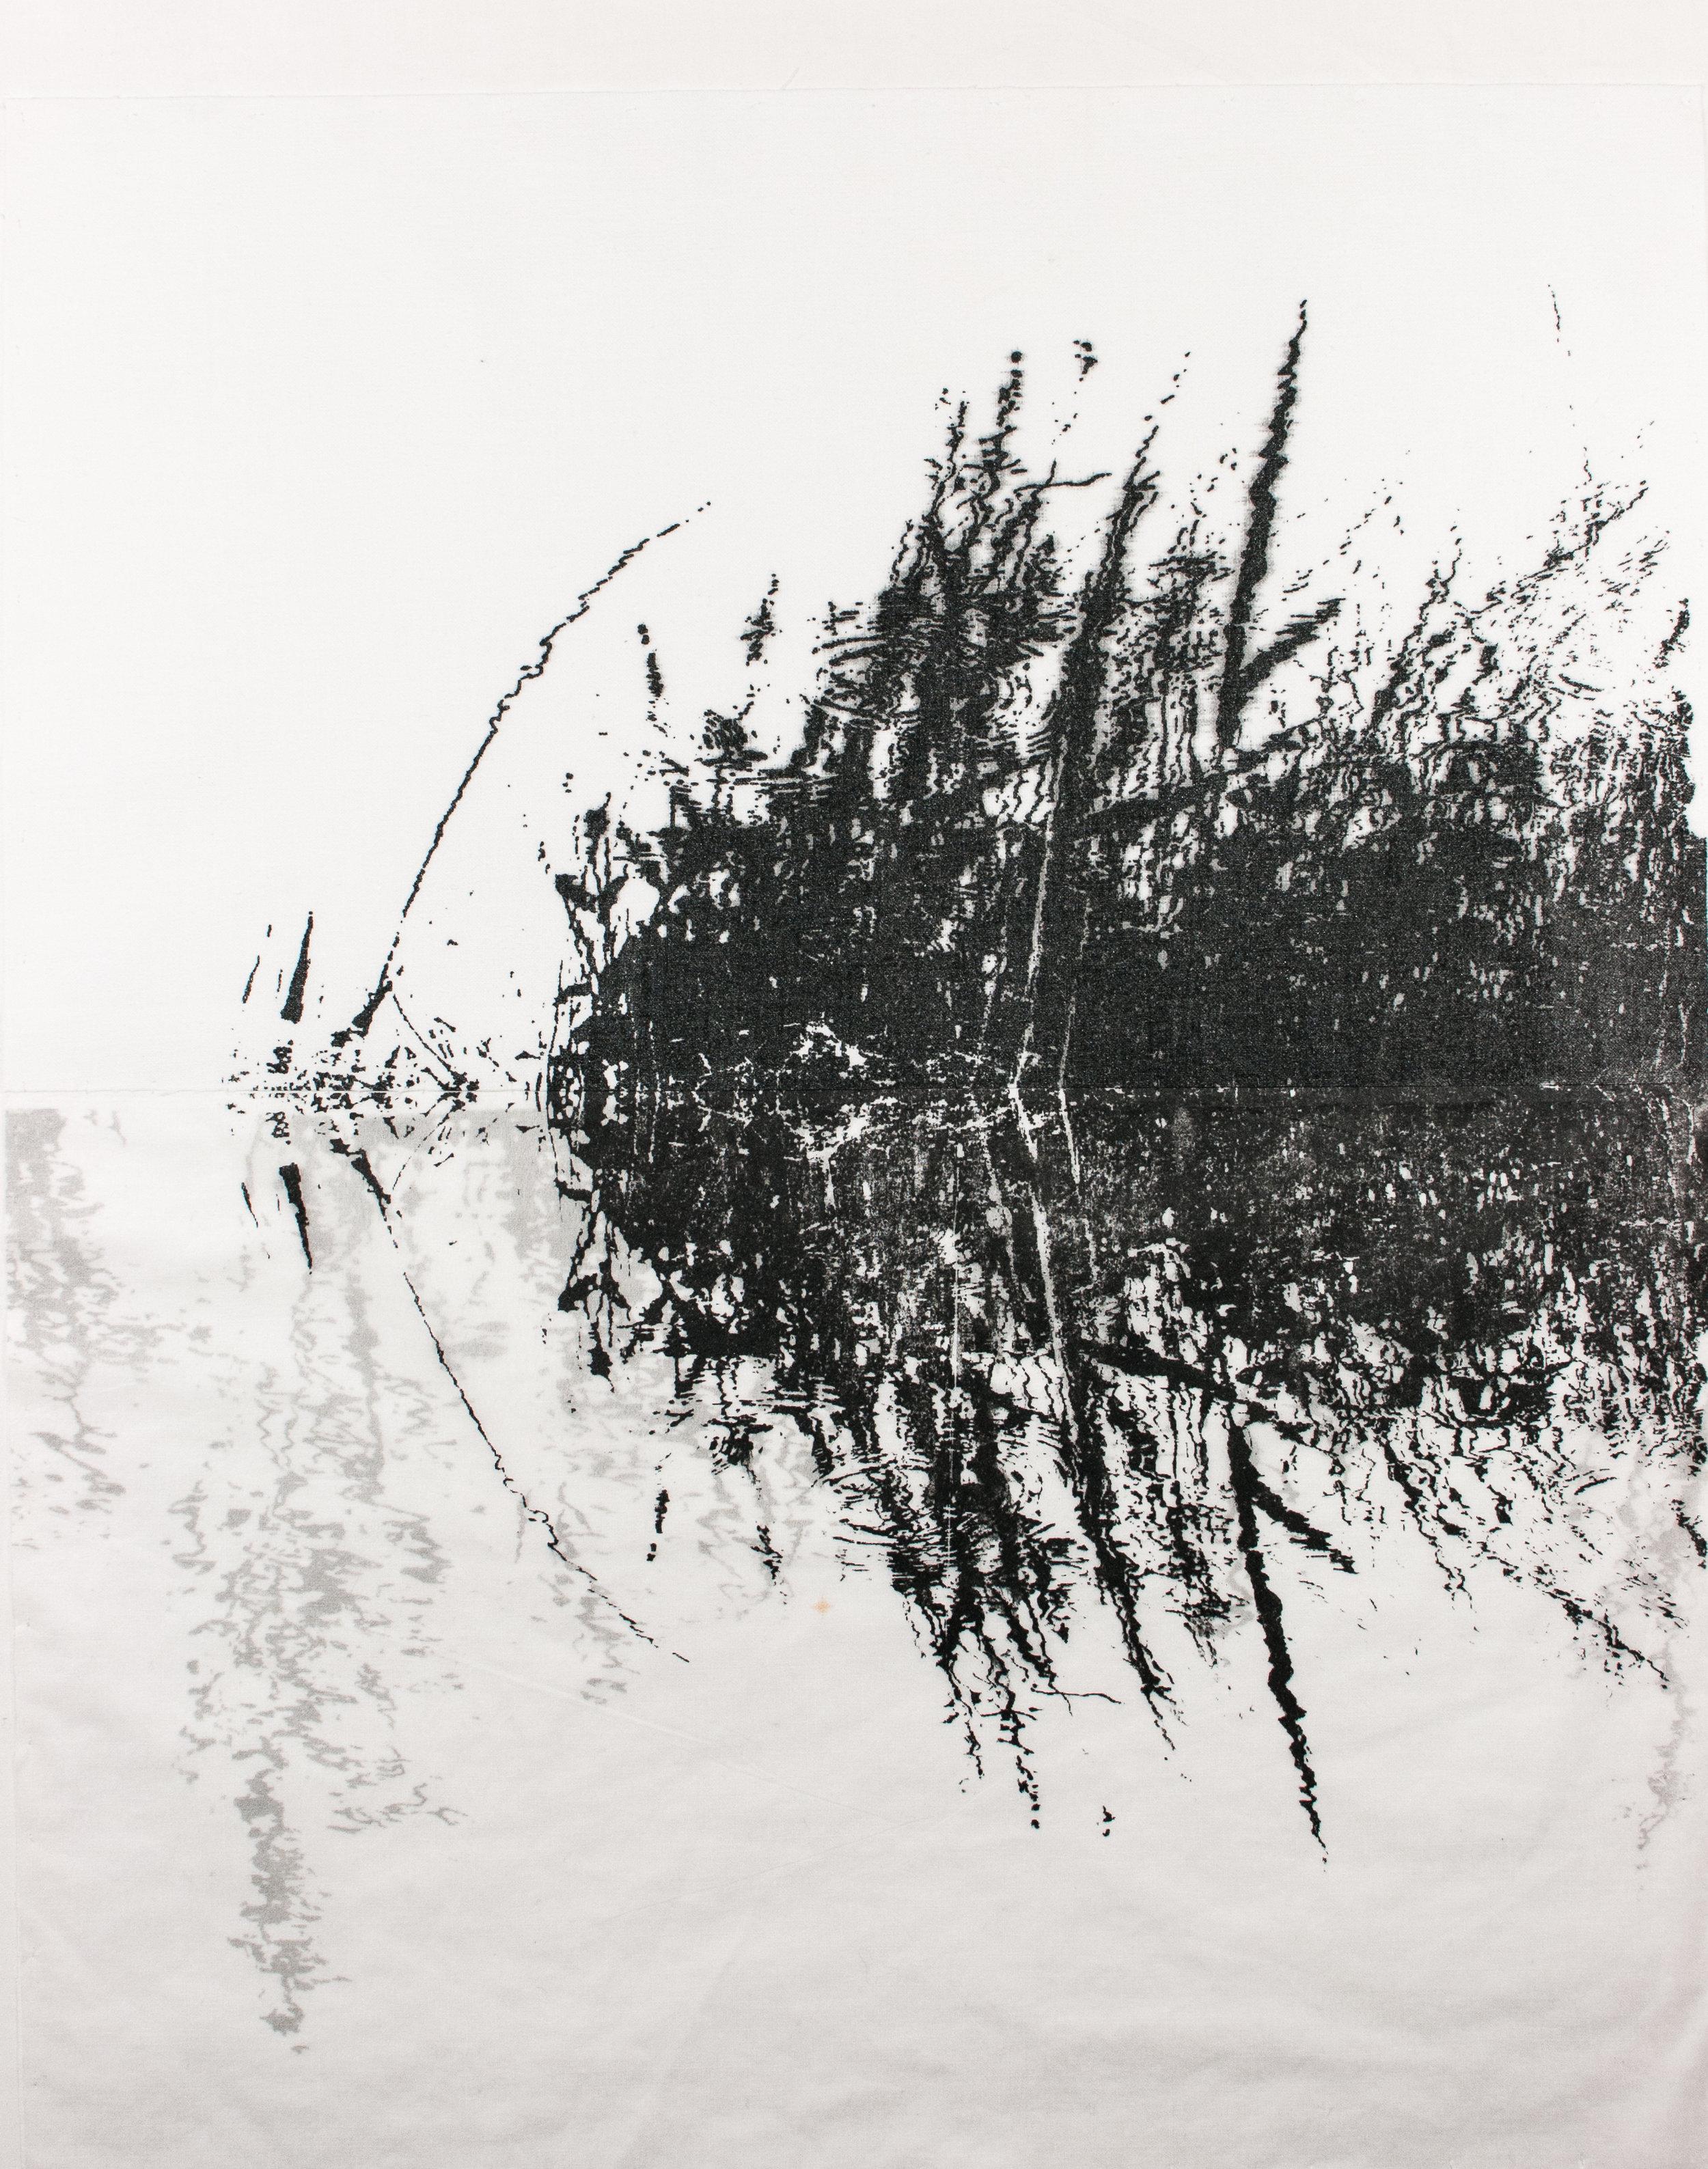 Wicken Fen: Monochrome 3